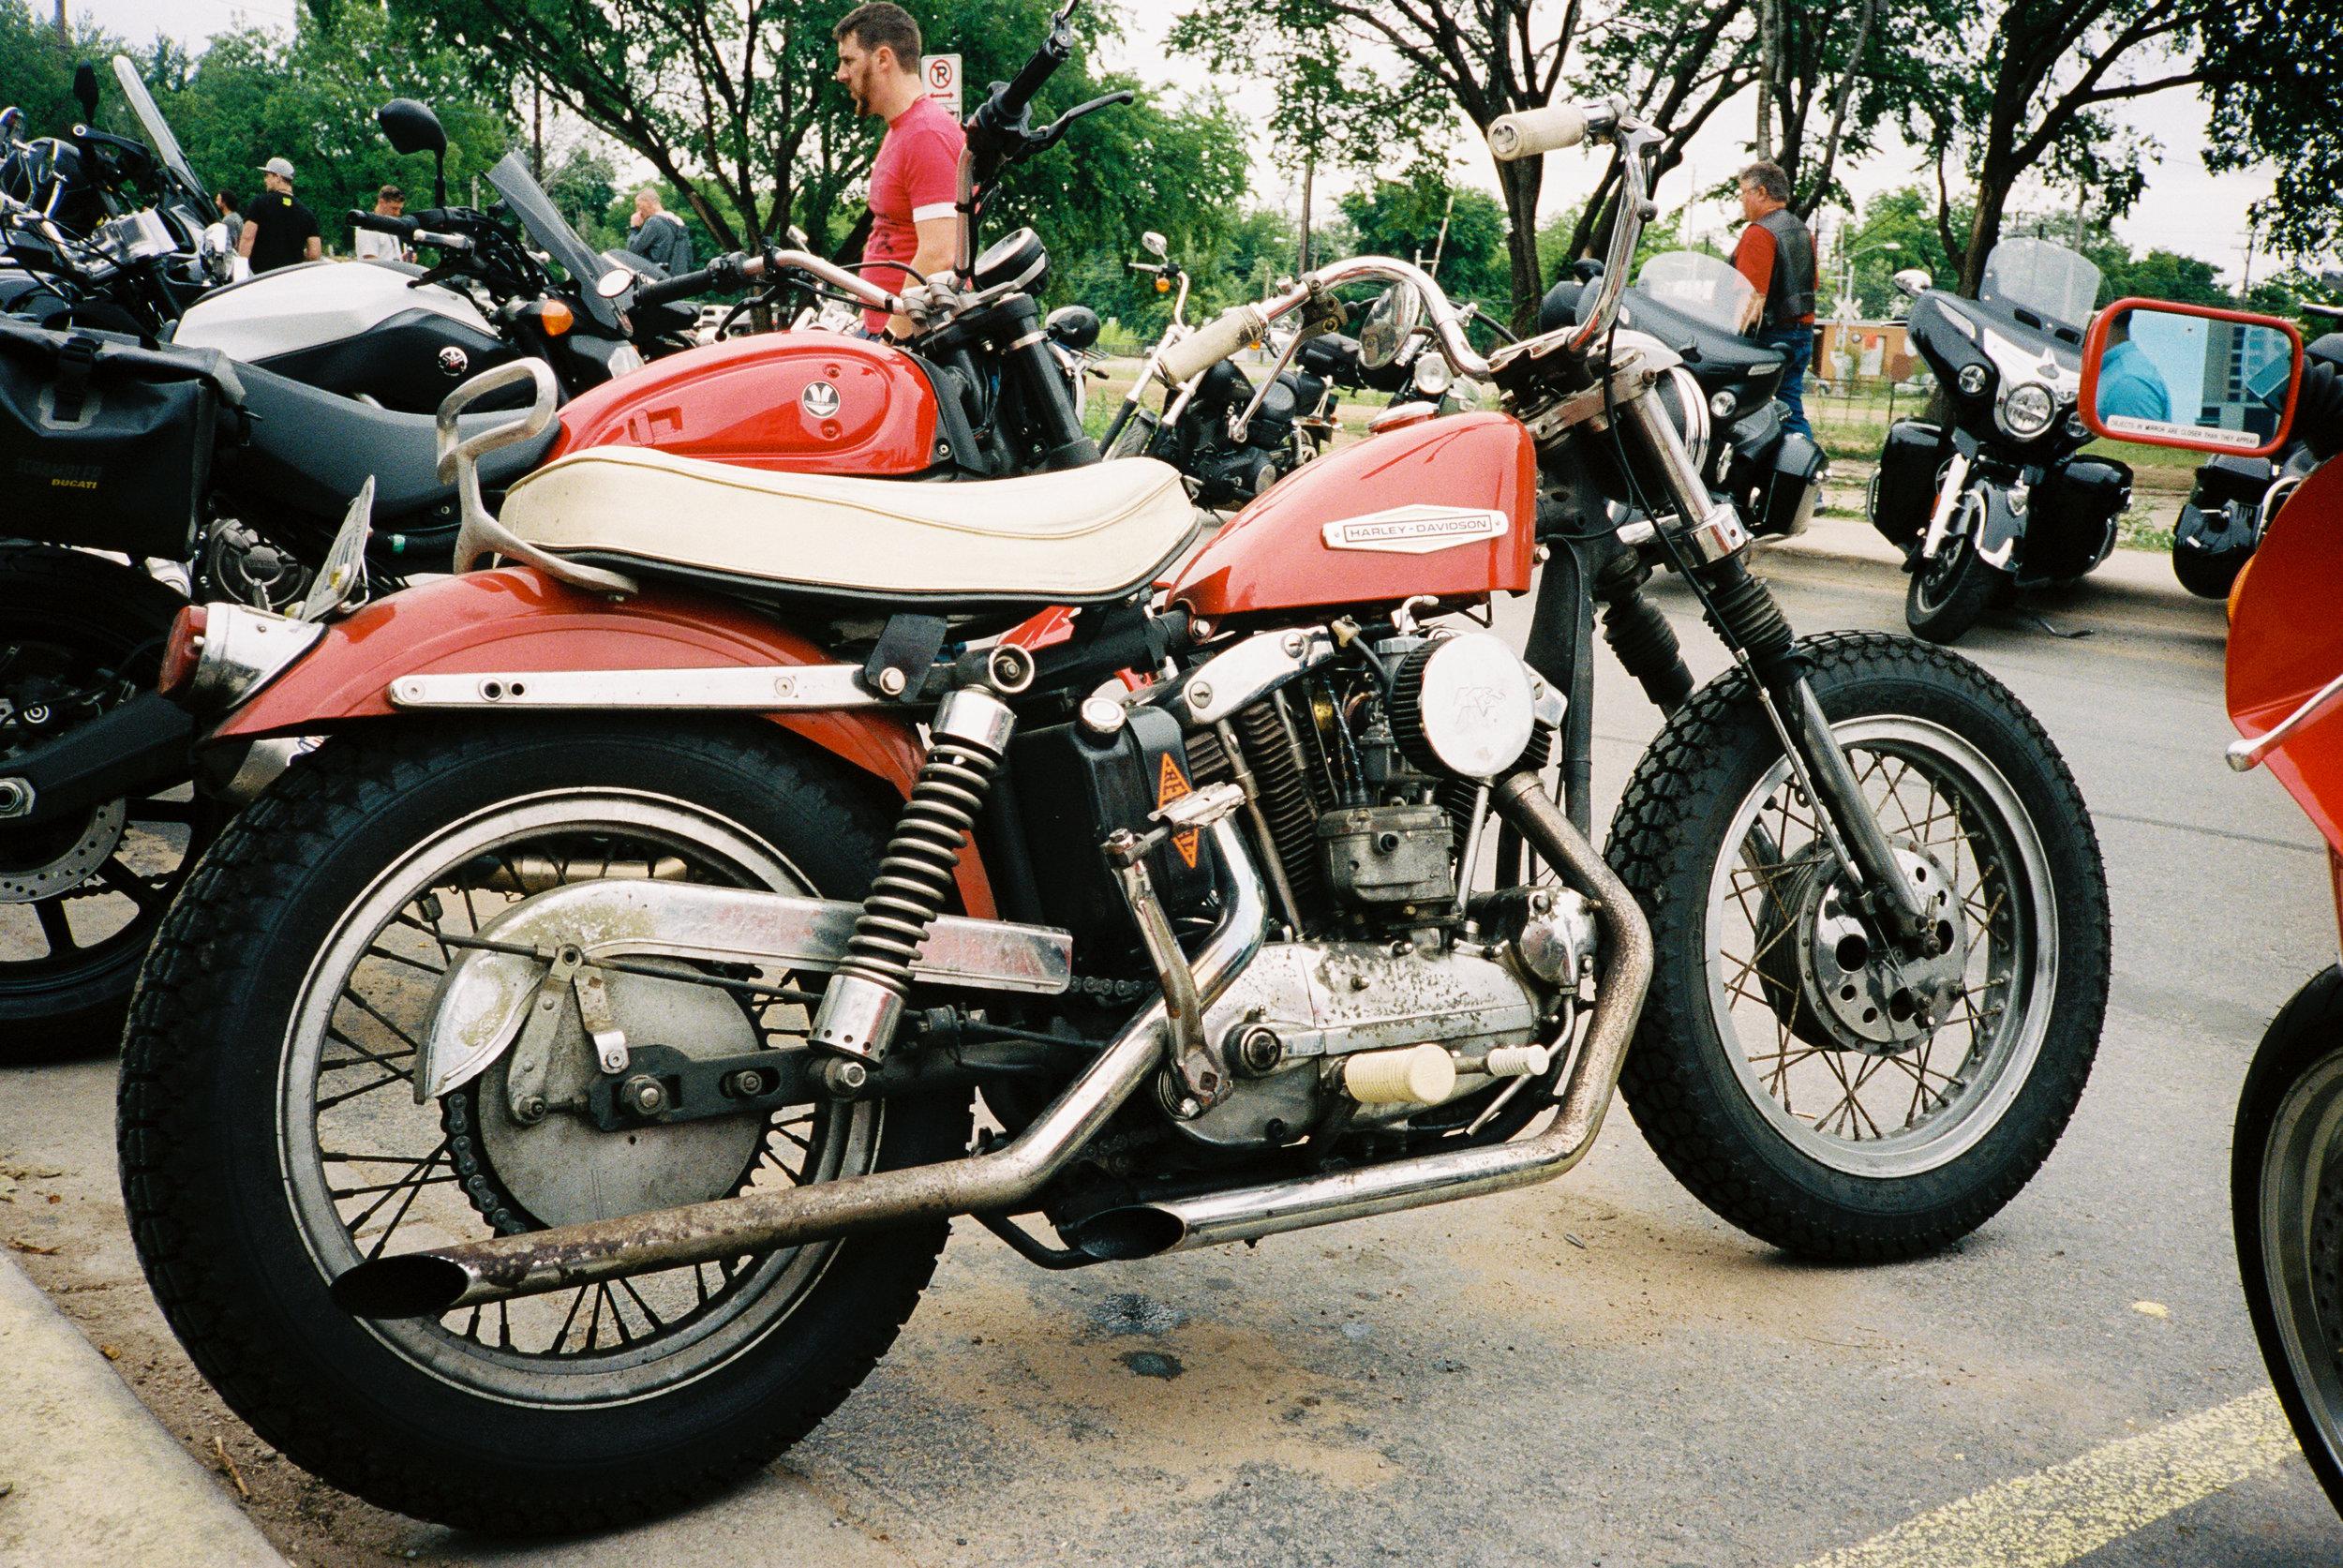 Handbuilt-Motorcycle-Show-2017--11.jpg